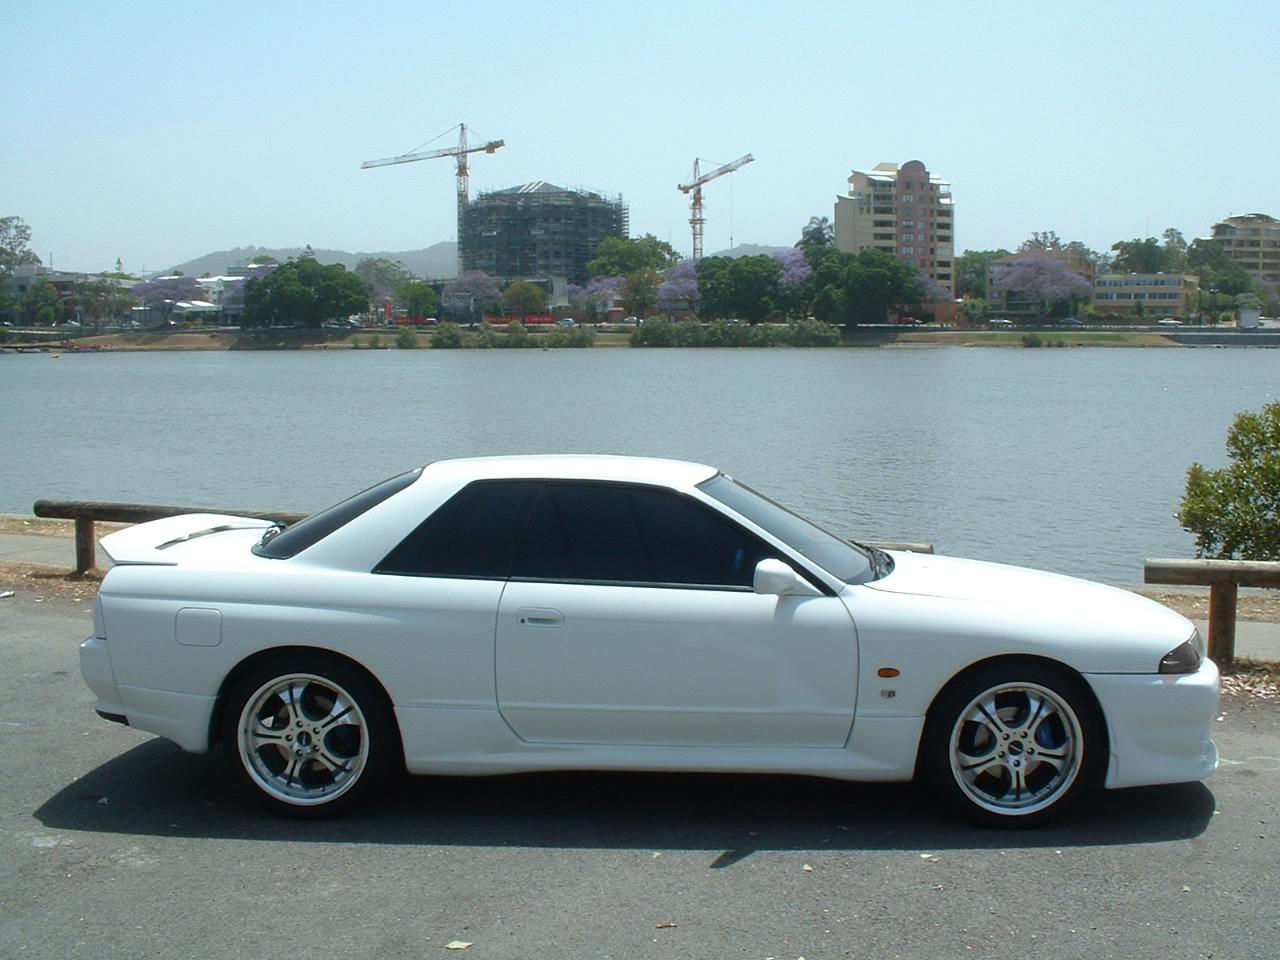 1992 Nissan Skyline Pictures Cargurus